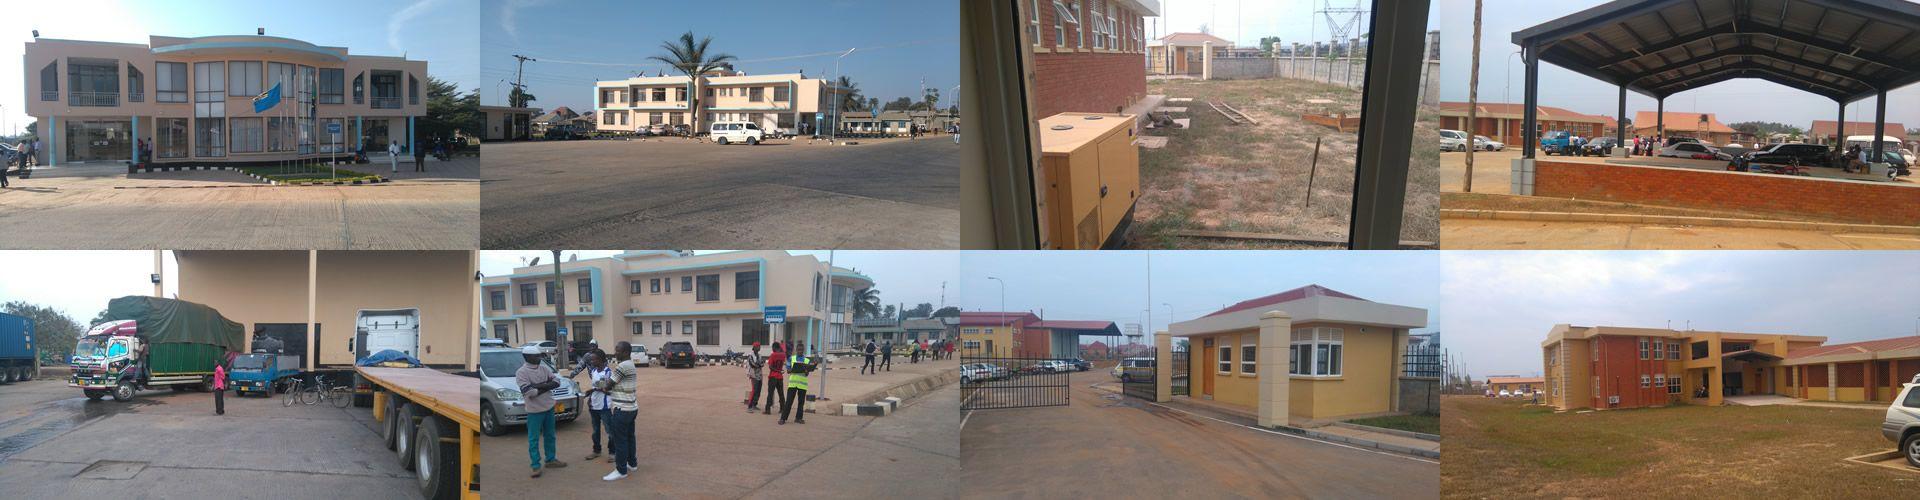 Mutukula Border Post | Uganda / Tanzania